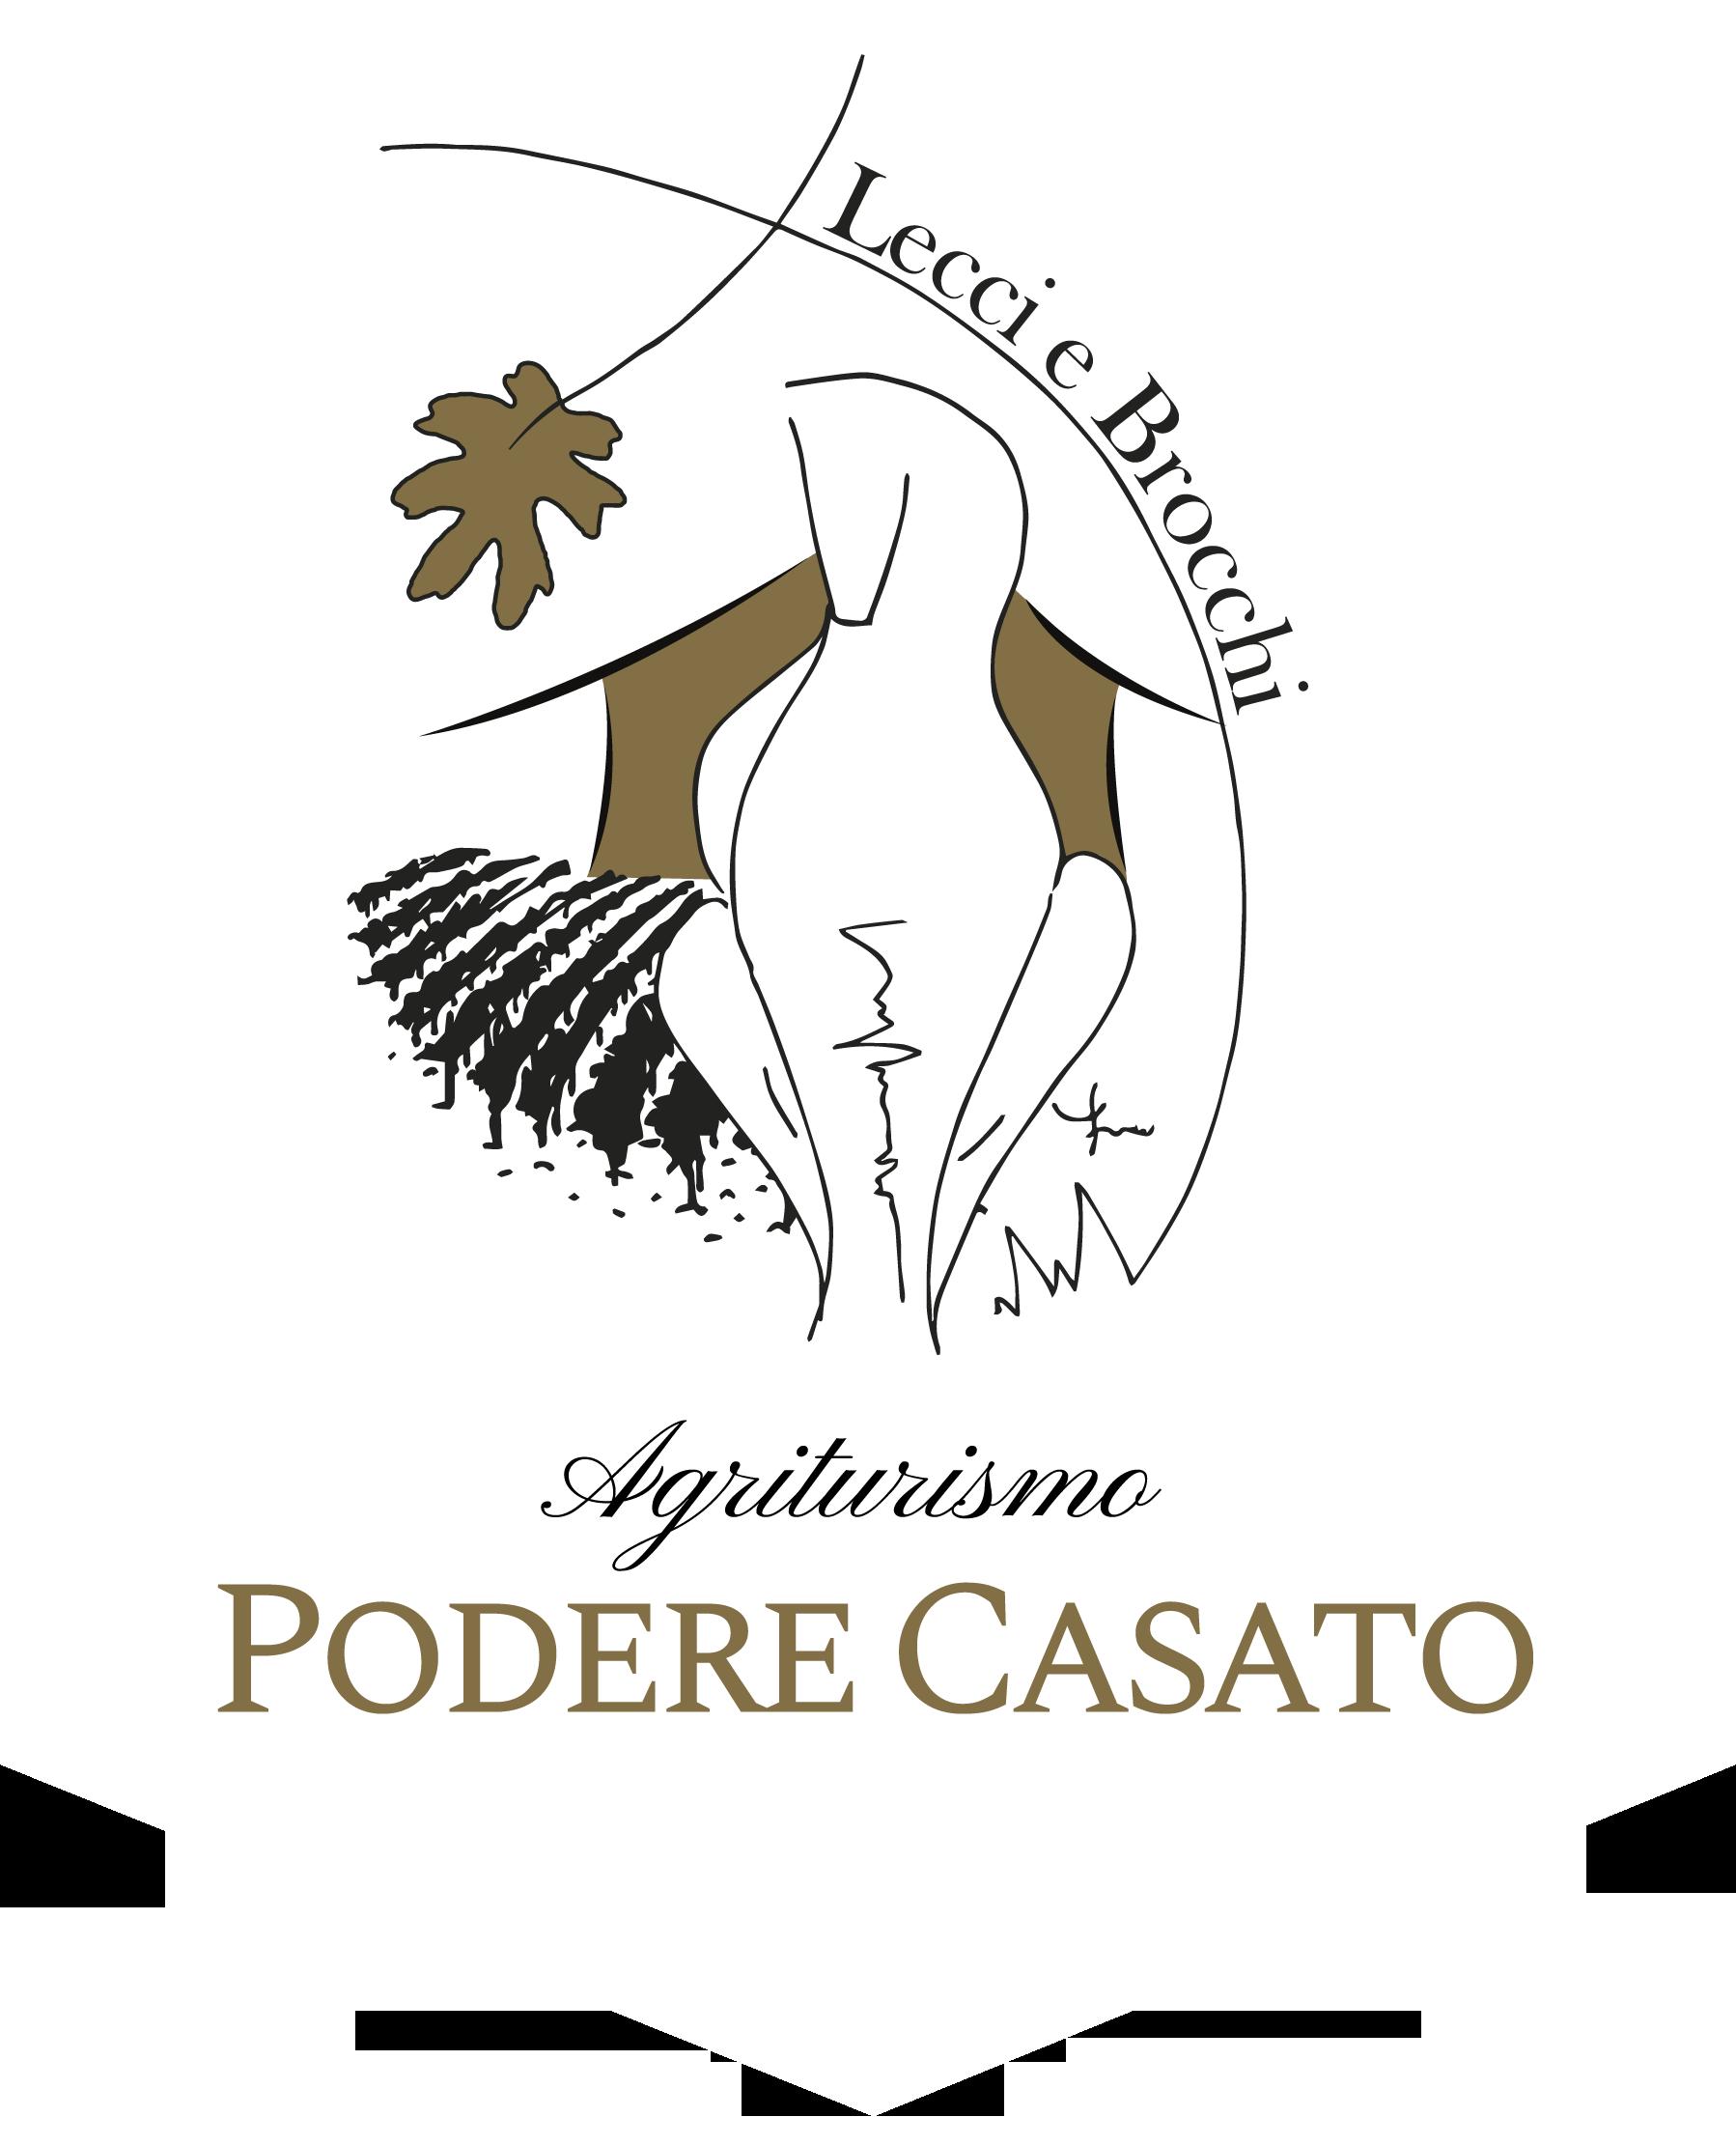 Agriturismo Toscana Siena Podere Casato